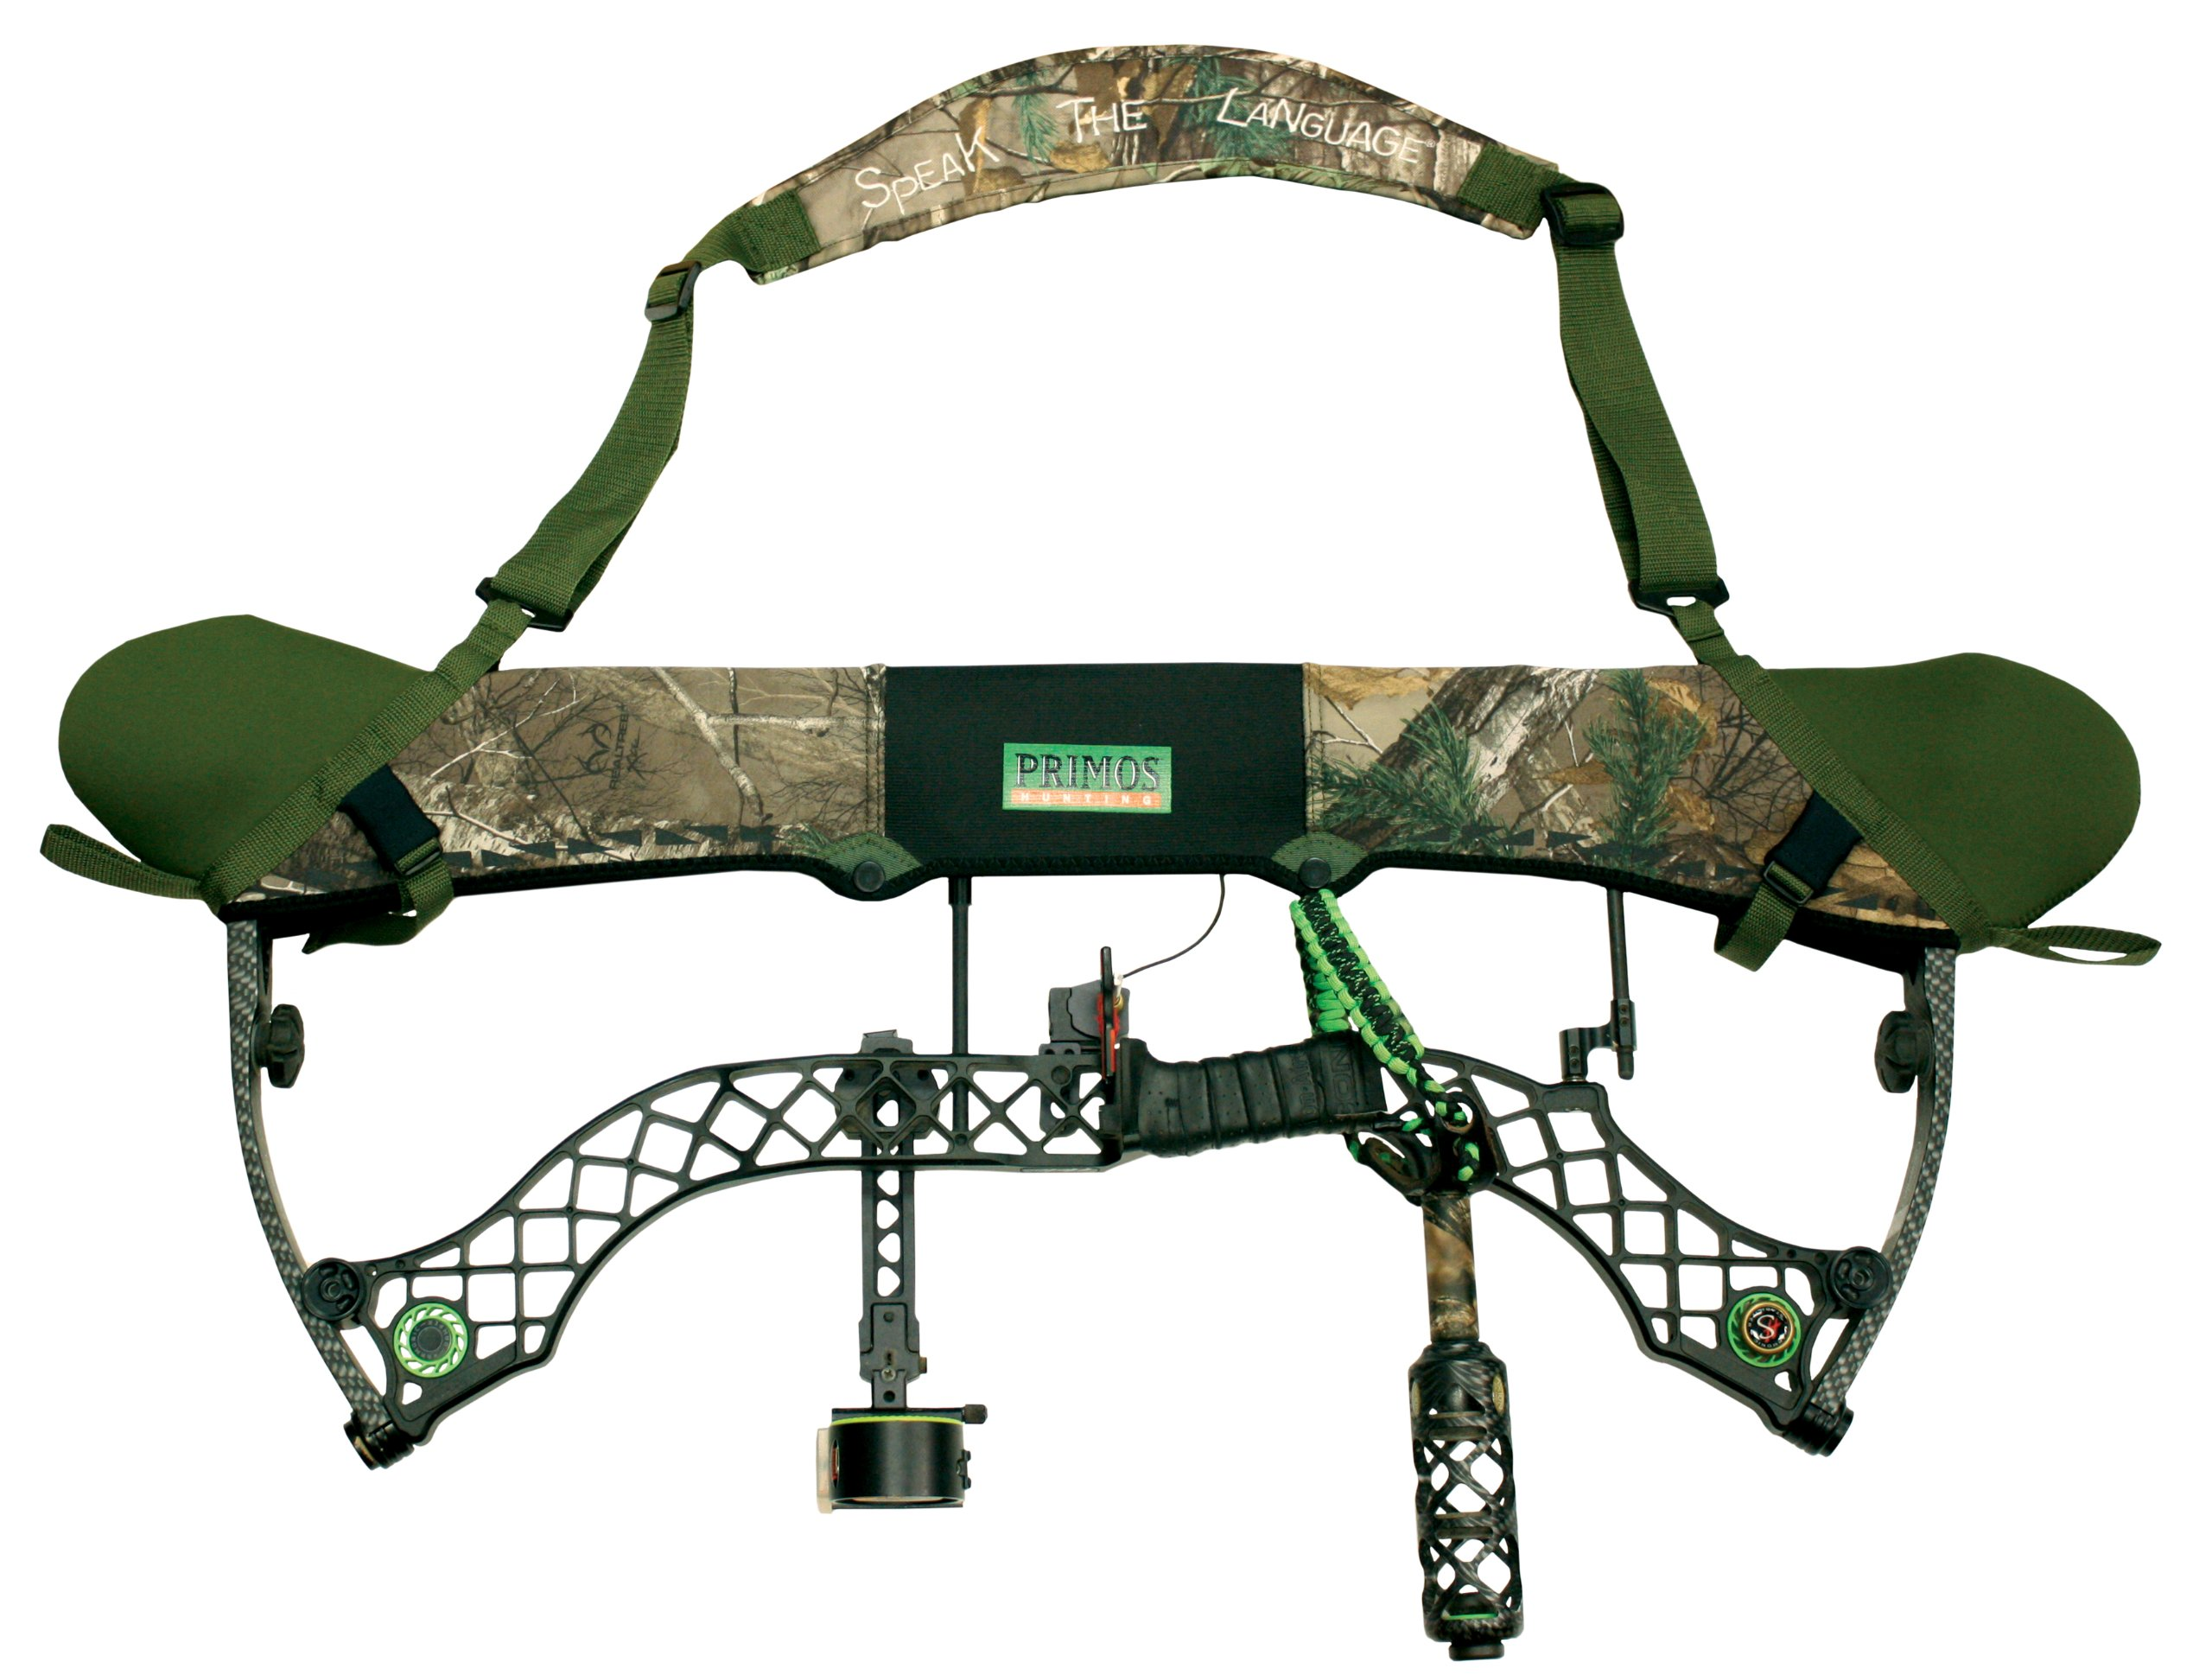 Primos Neoprene Bow Sling,Realtree AP Xtra Camo by Primos Hunting